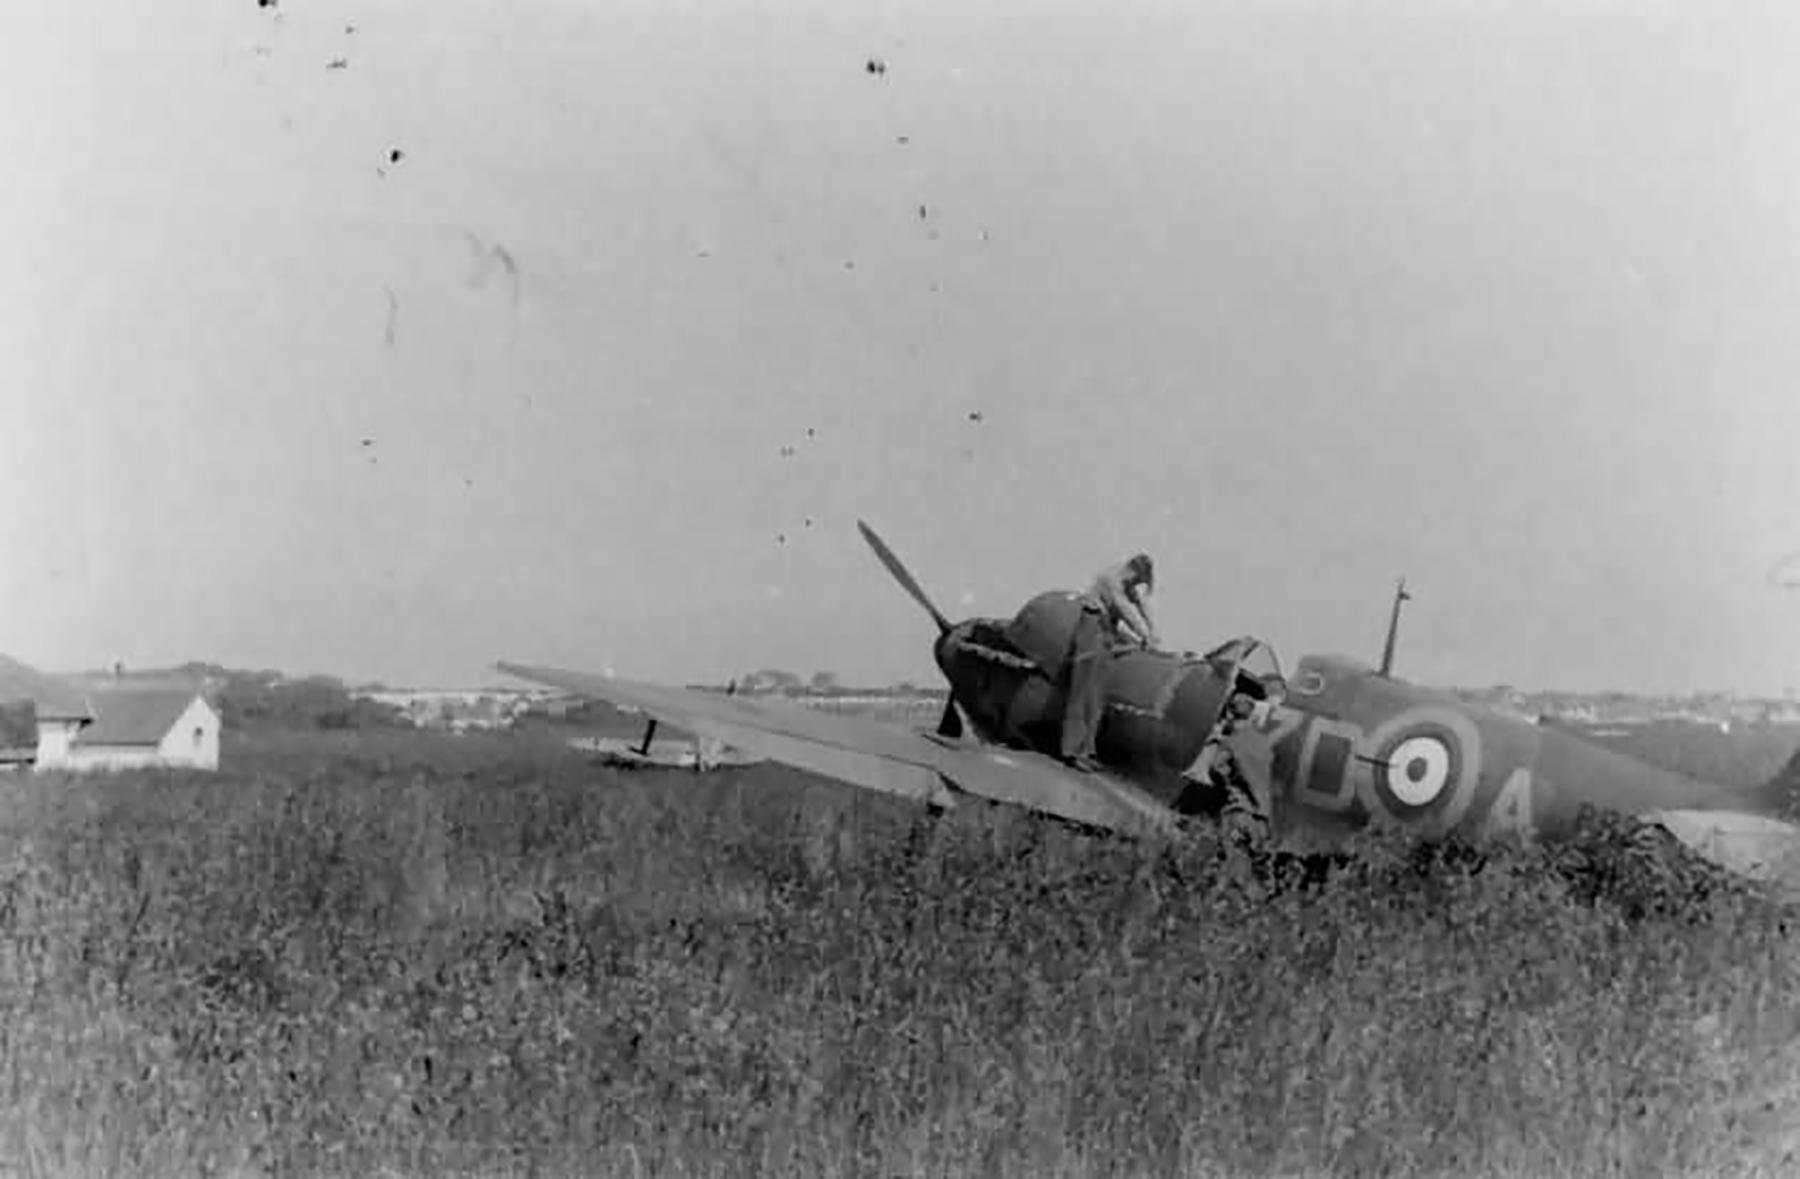 Spitfire MkIa RAF 222Sqn ZDA P9317 PO Falkust force landed Le Touquet Dunkerque 1st Jun 1940 05